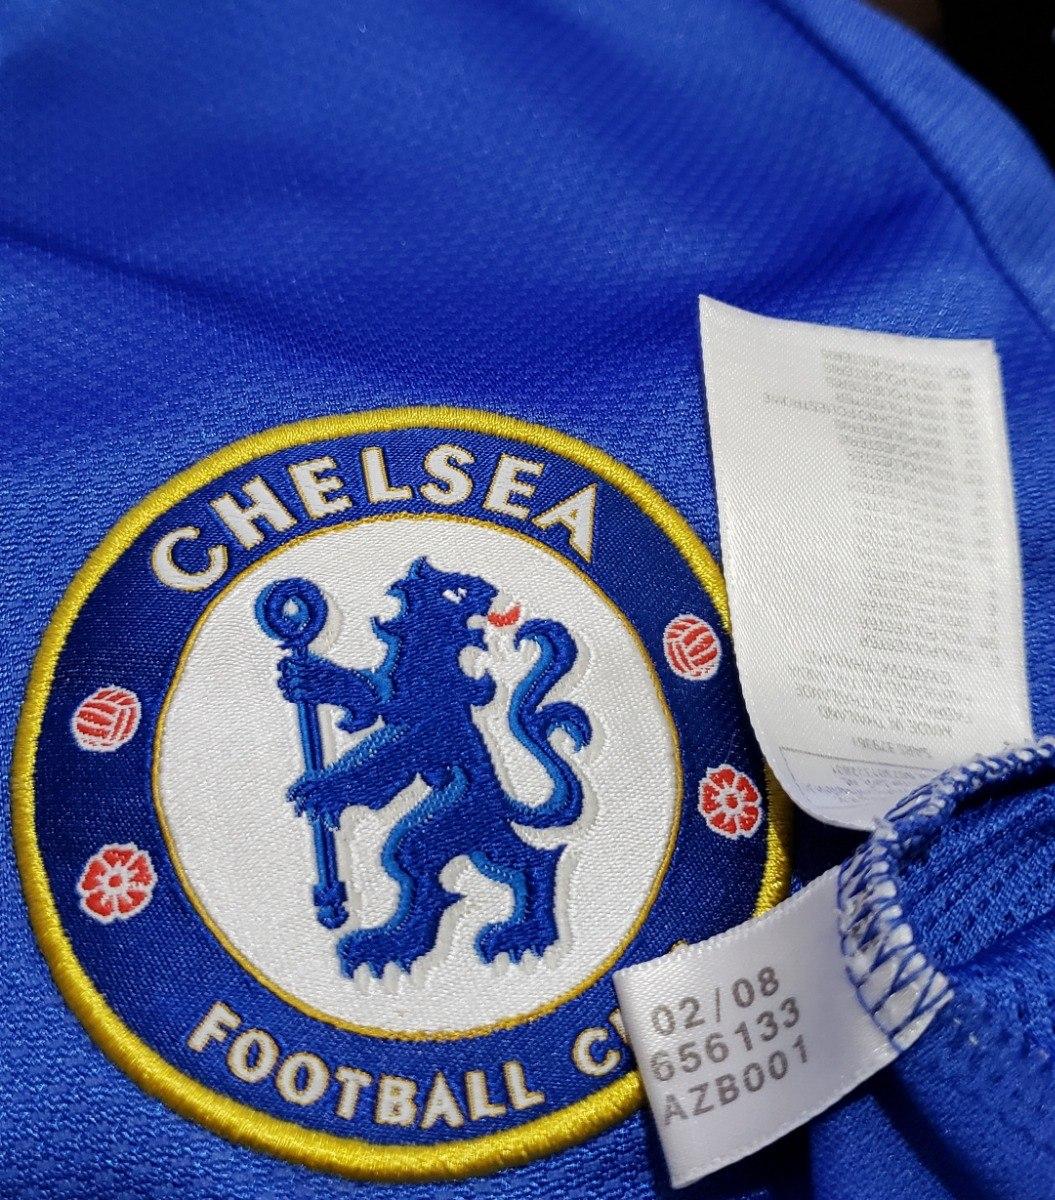 ad8eed1102f98 camisa futebol oficial chelsea inglaterra 2008 home adidas p. Carregando  zoom.